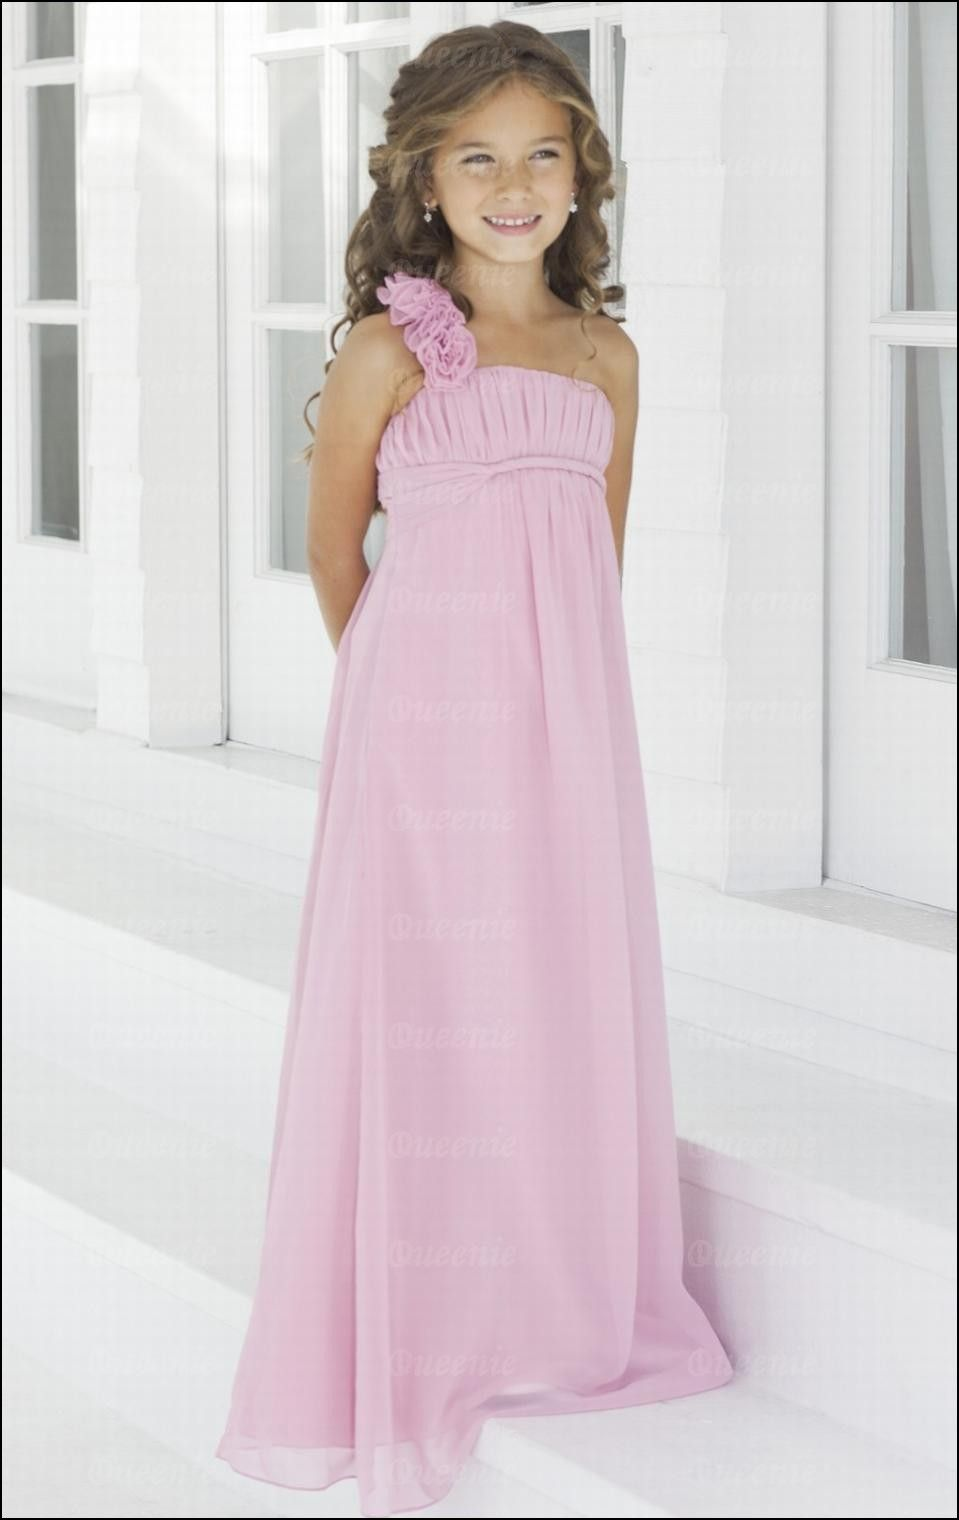 Purple childrens bridesmaid dresses dresses and gowns ideas purple childrens bridesmaid dresses ombrellifo Gallery